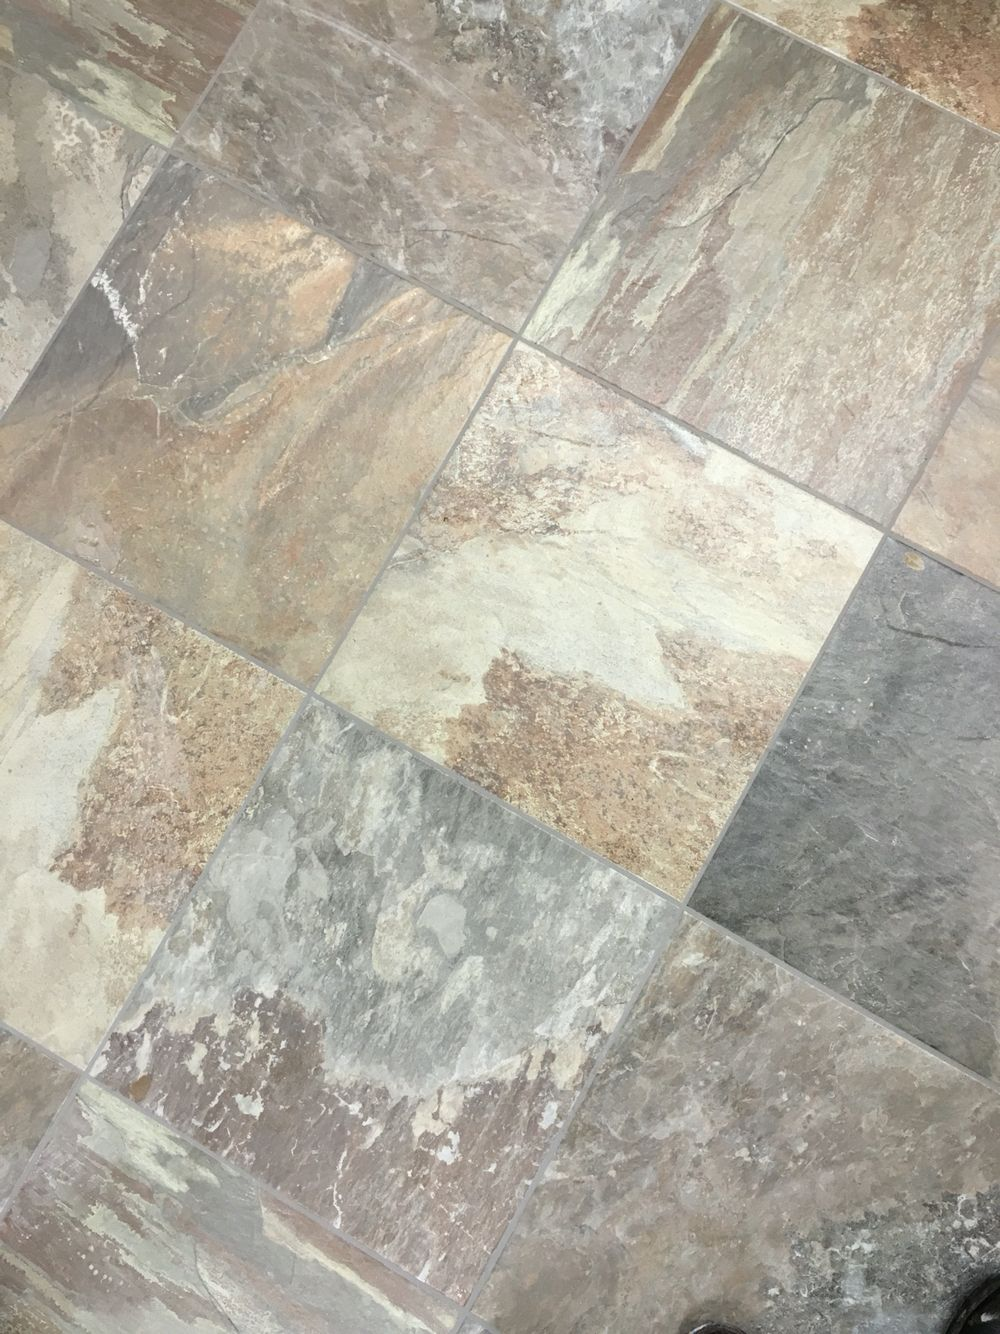 Rajah Slate Effect Ceramic Floor Tiles Now At Amazing Low Prices At Www Tiledealer Co Uk Ceramic Floor Tiles Tile Suppliers Adhesive Tiles